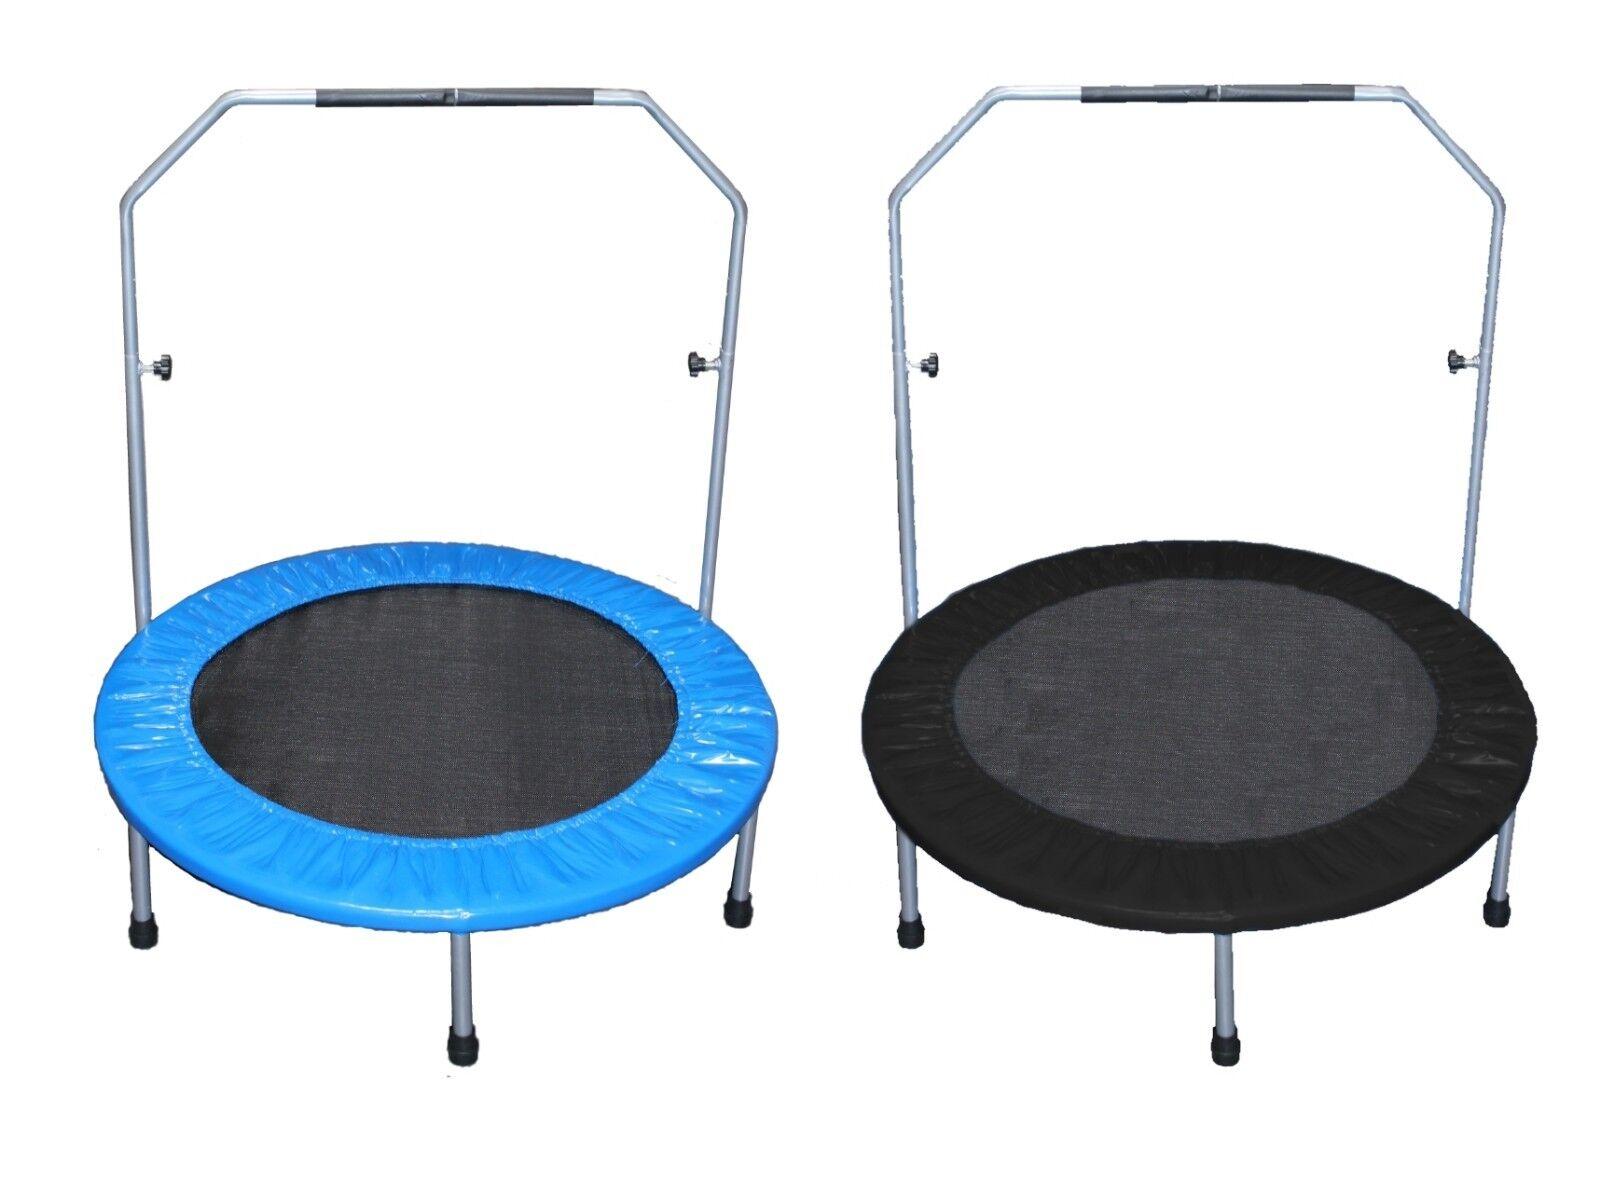 Fitness Trampolin 100cm Minitrampolin Jumping 1m Randabdeckung blau blau blau oder schwarz e1ca91